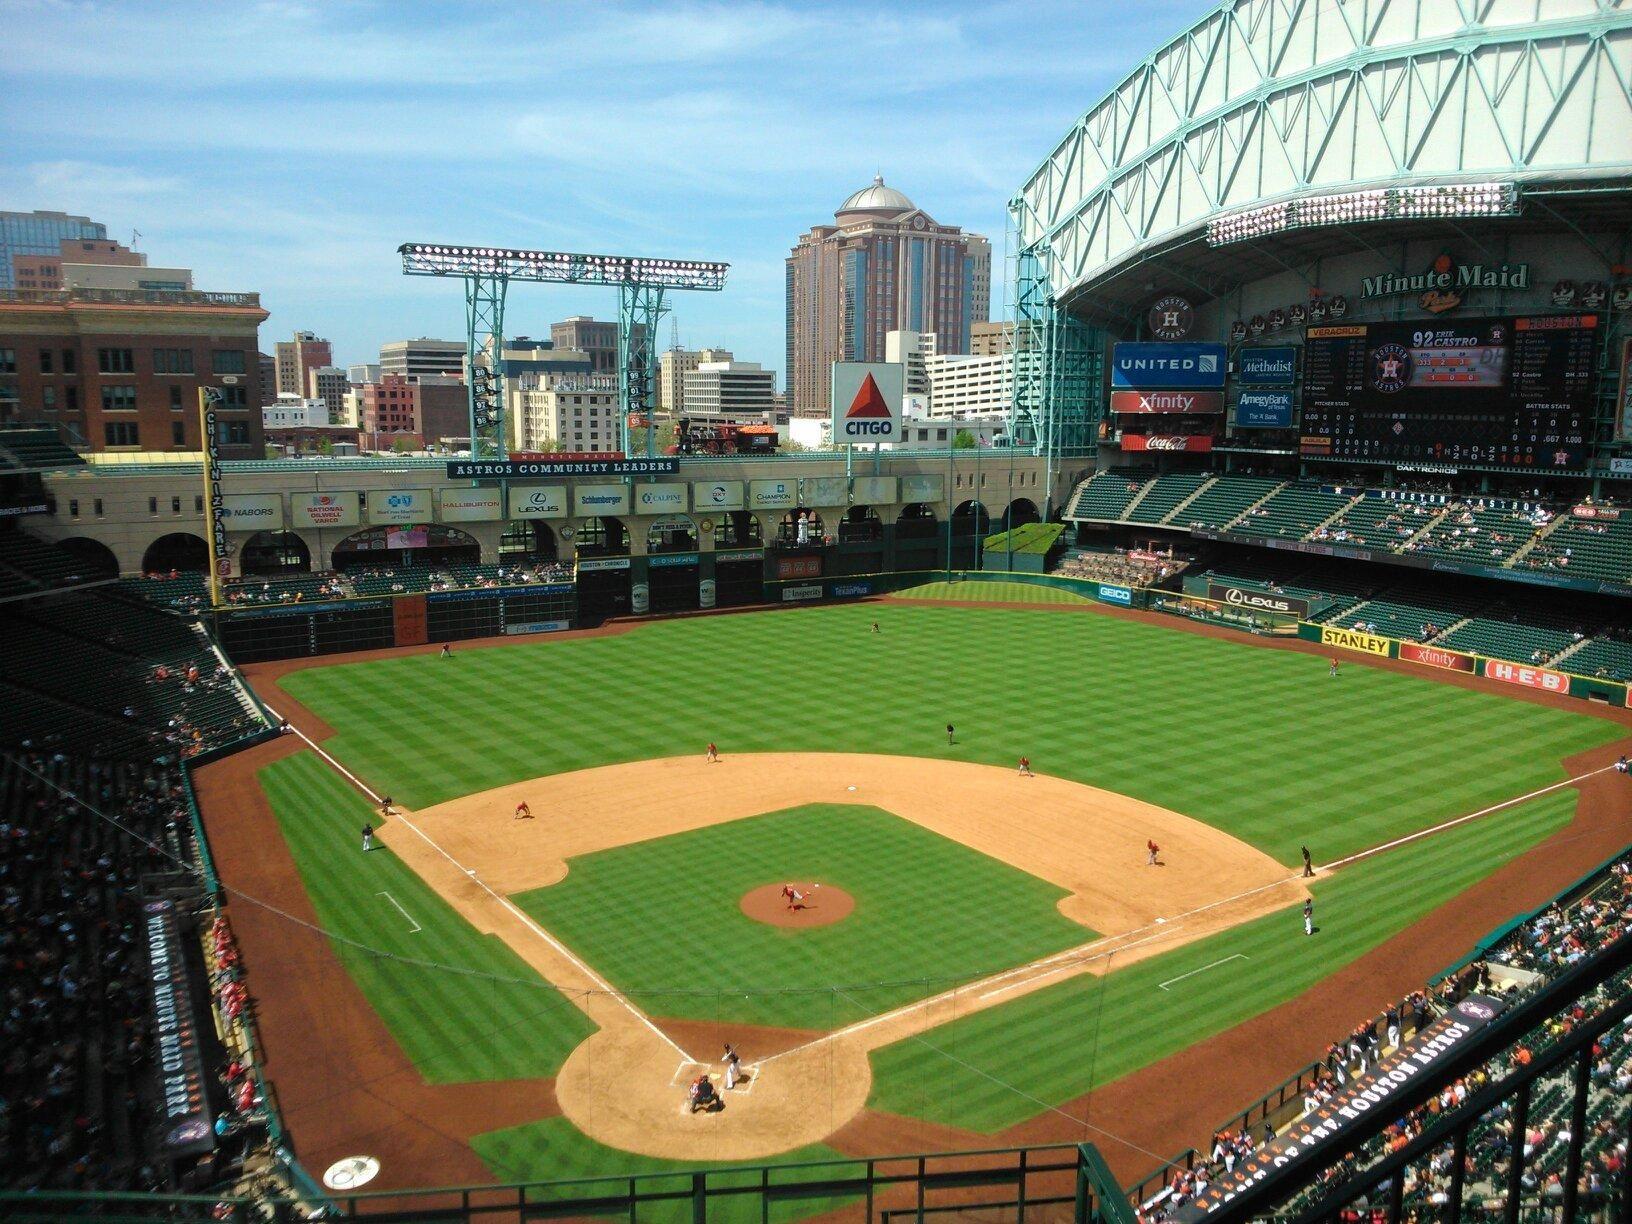 Houston S Official Hop On Hop Off Tour Baseball Stadiums Parks Minute Maid Park Houston Baseball Park